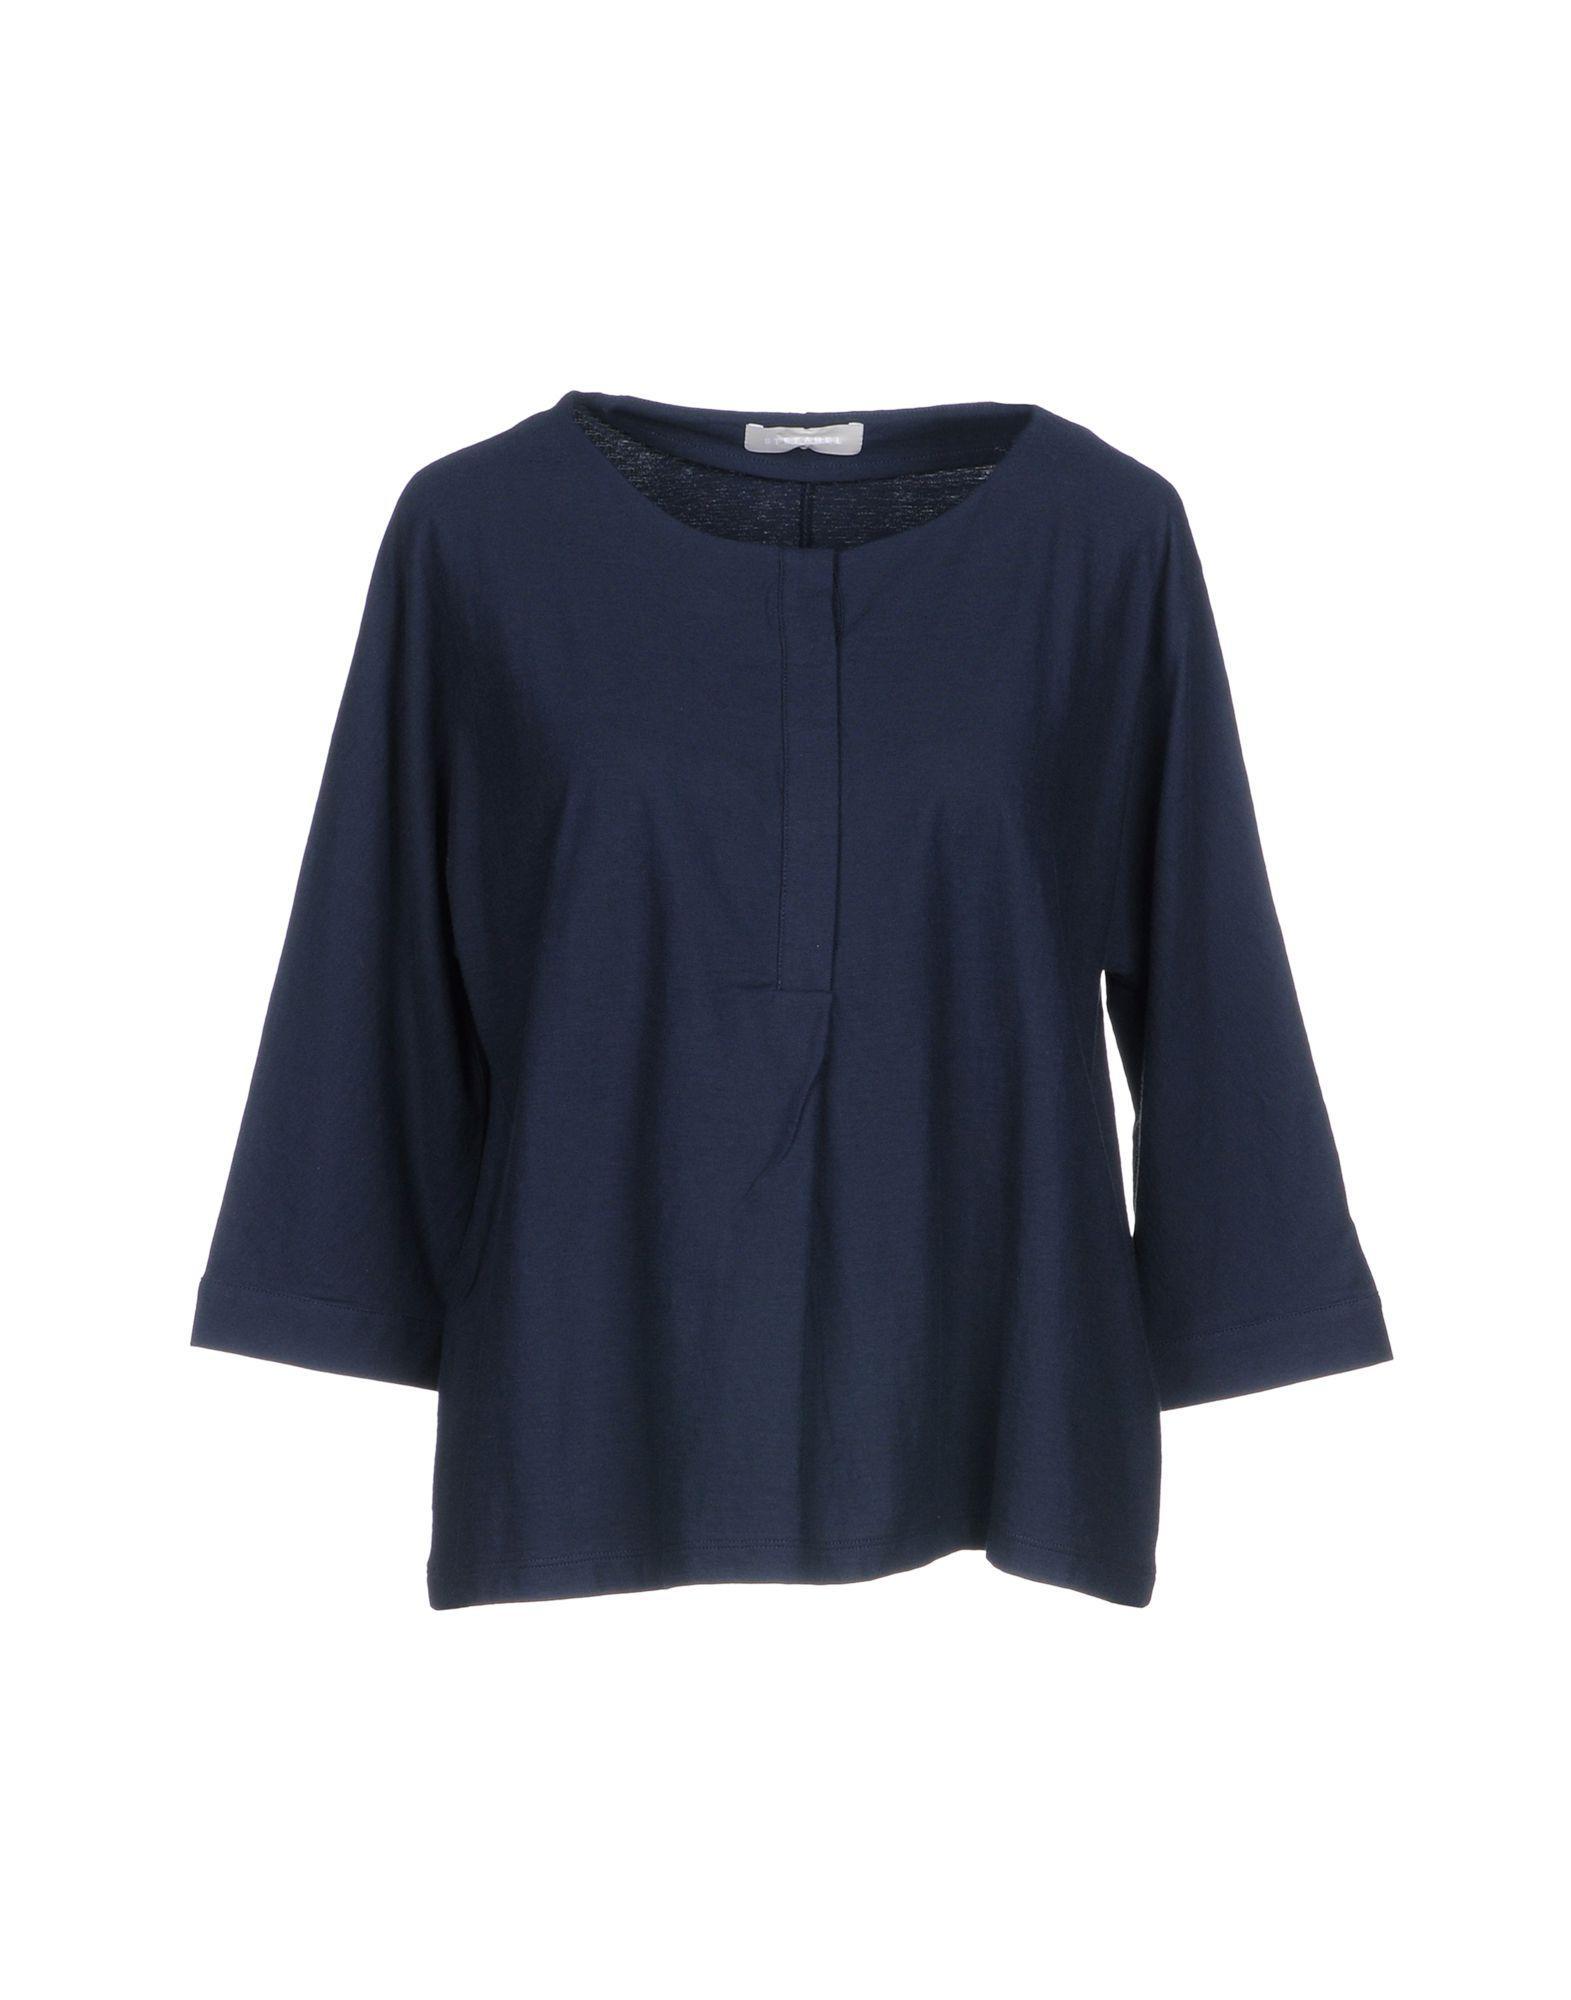 Stefanel T-shirt in Blue - Lyst fa9677a5f8b5